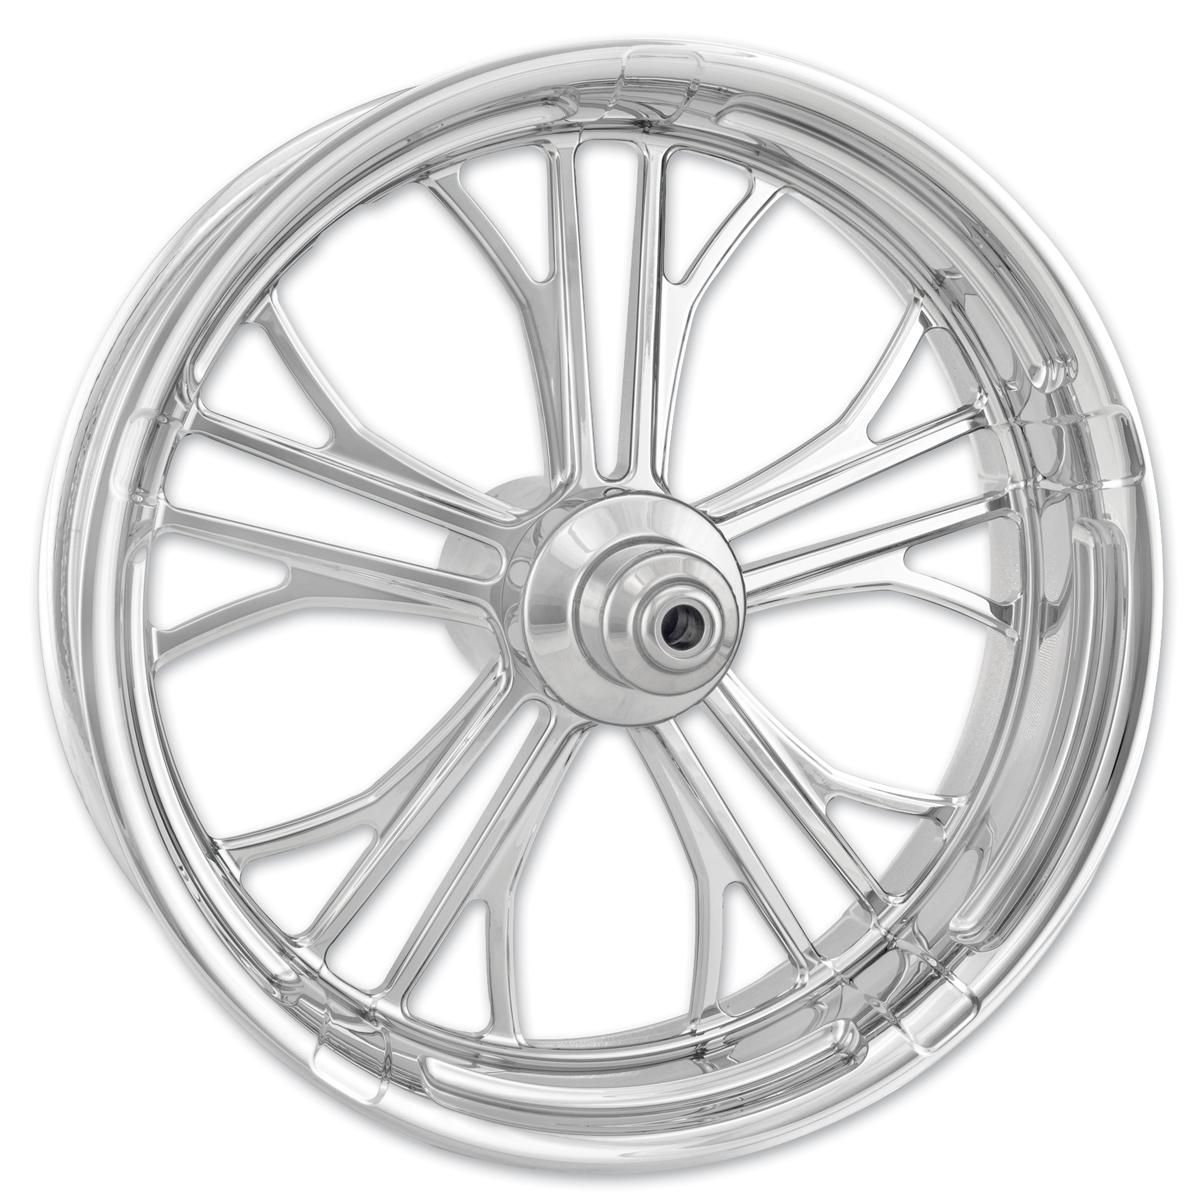 Performance Machine Dixon Chrome Rear Wheel, 18